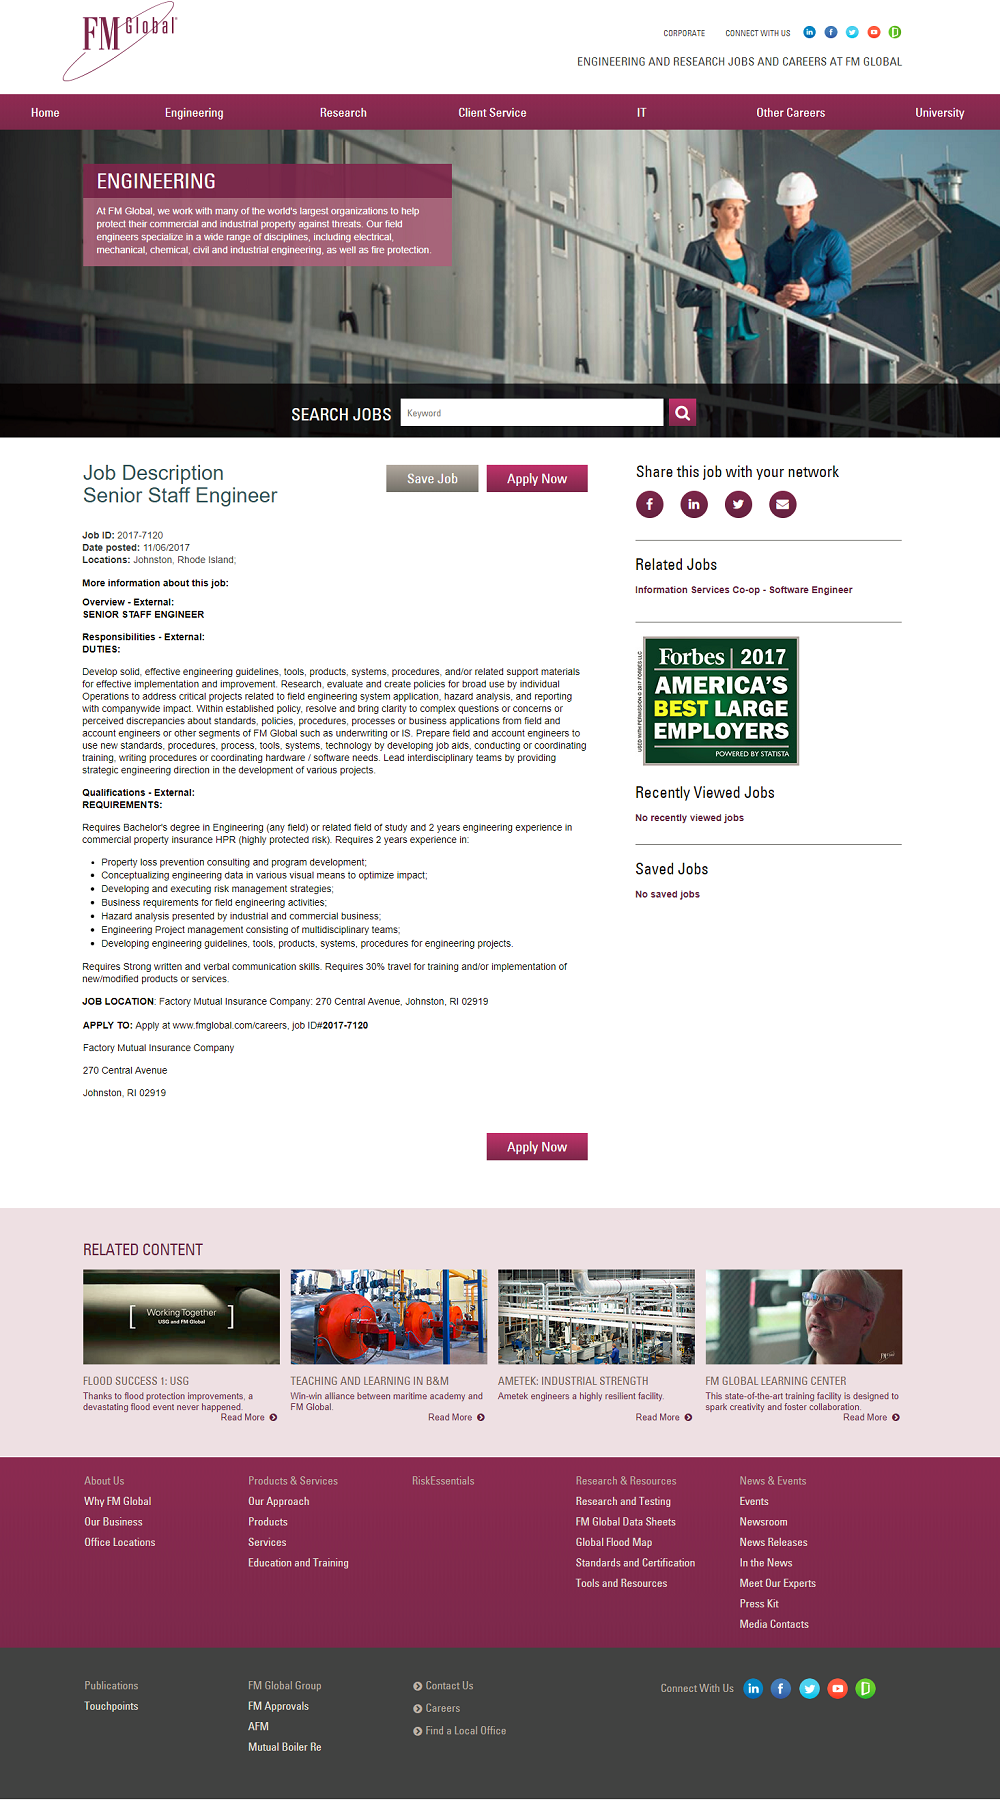 FMGlobal iCims ATS Job Description Page